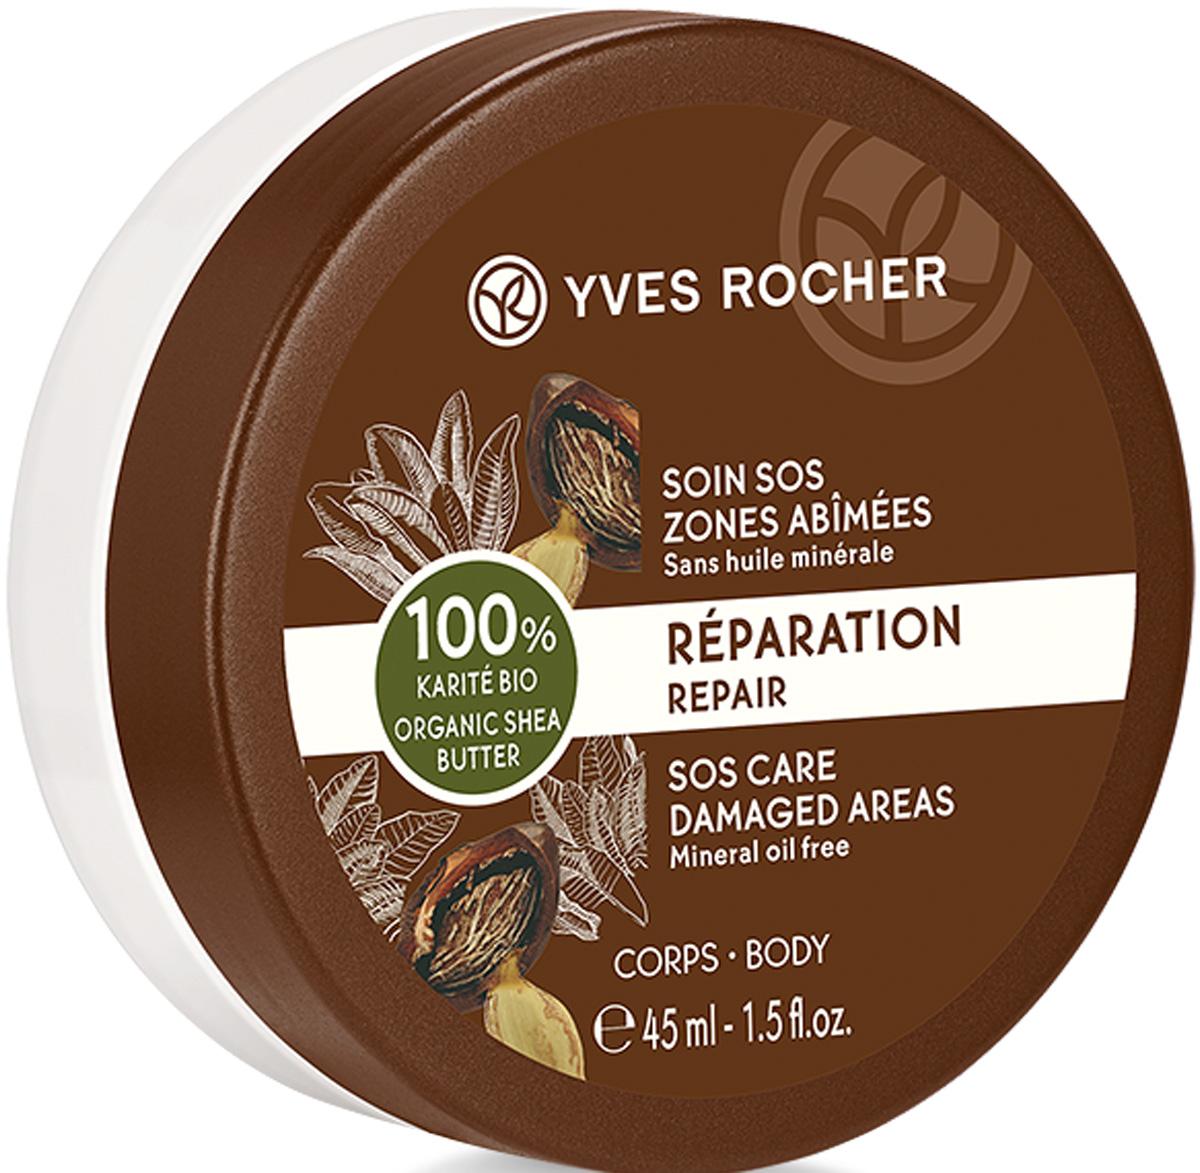 Yves Rocher интенсивно восстанавливающий концентрат для тела 100% каритэ, 45 мл онлайн чат ив роше